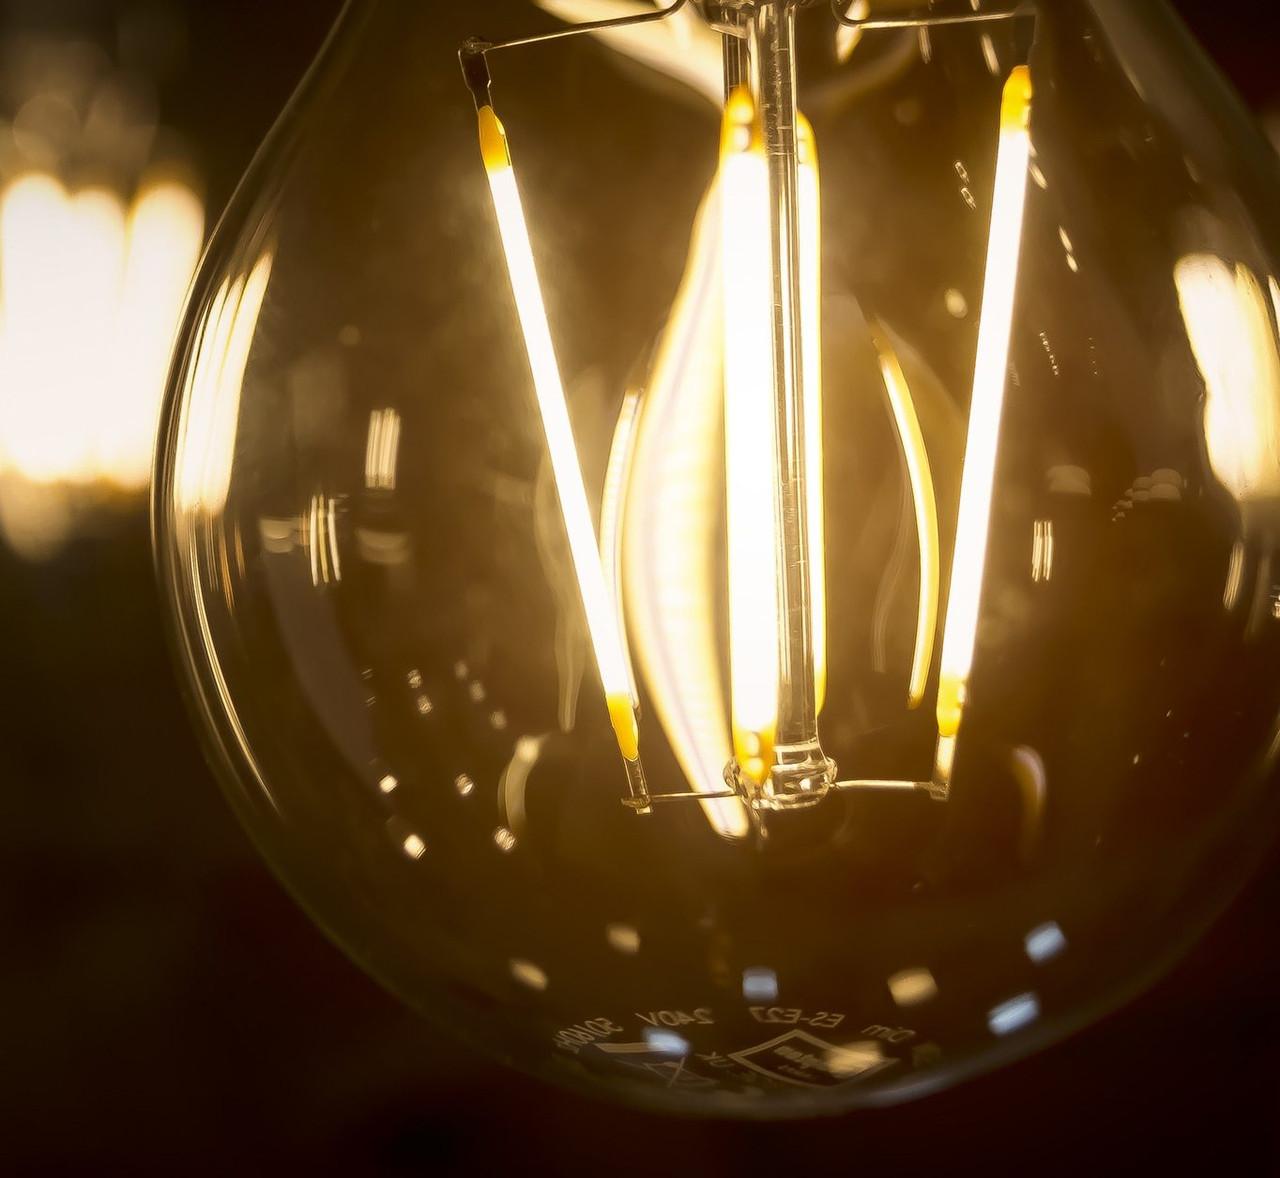 LED Dimmable A60 7.5 Watt Light Bulbs